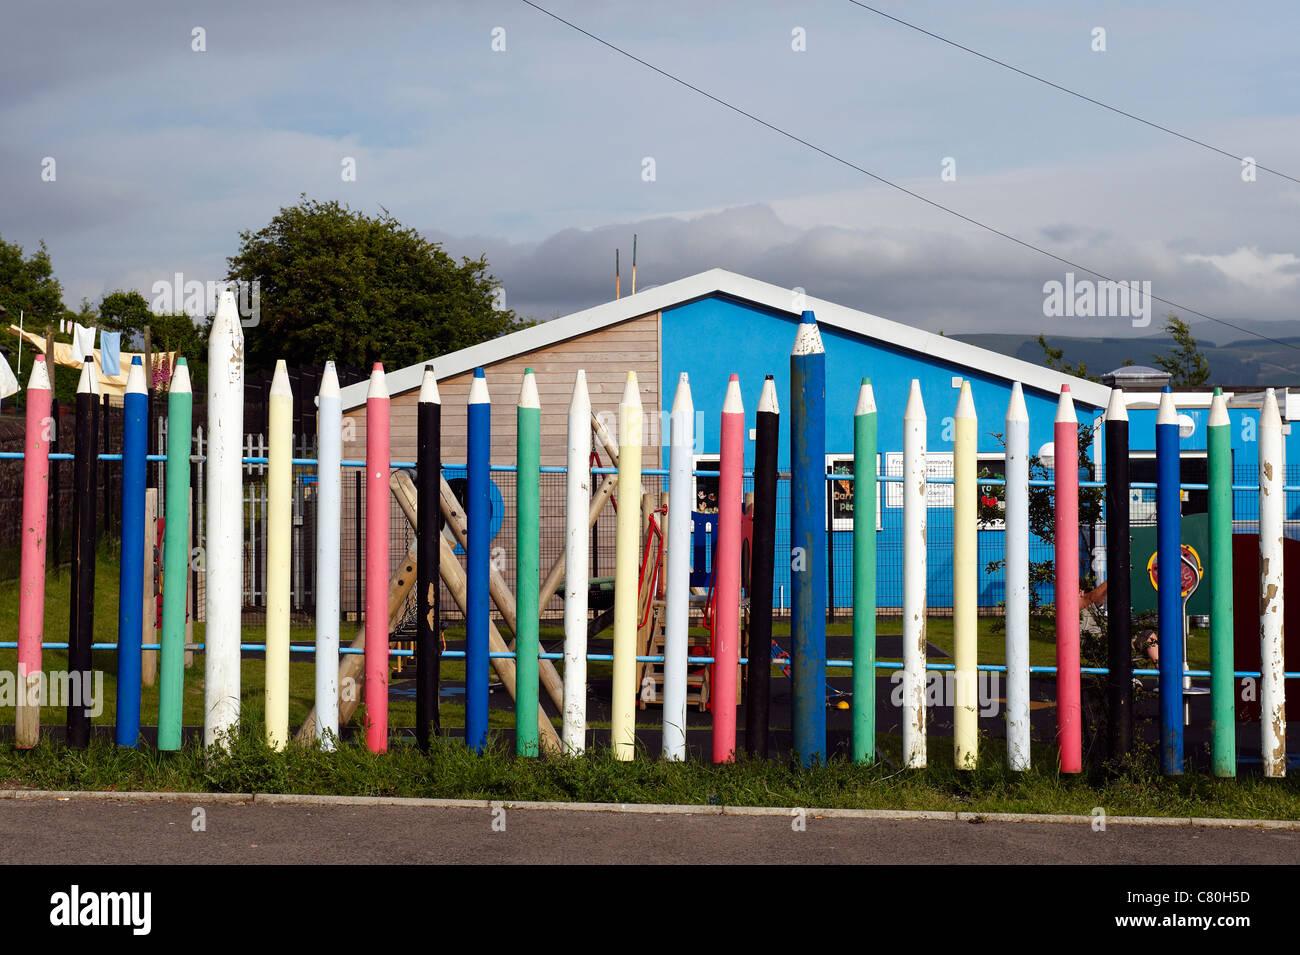 United Kingdom, England, Cumbria, Cleator school - Stock Image